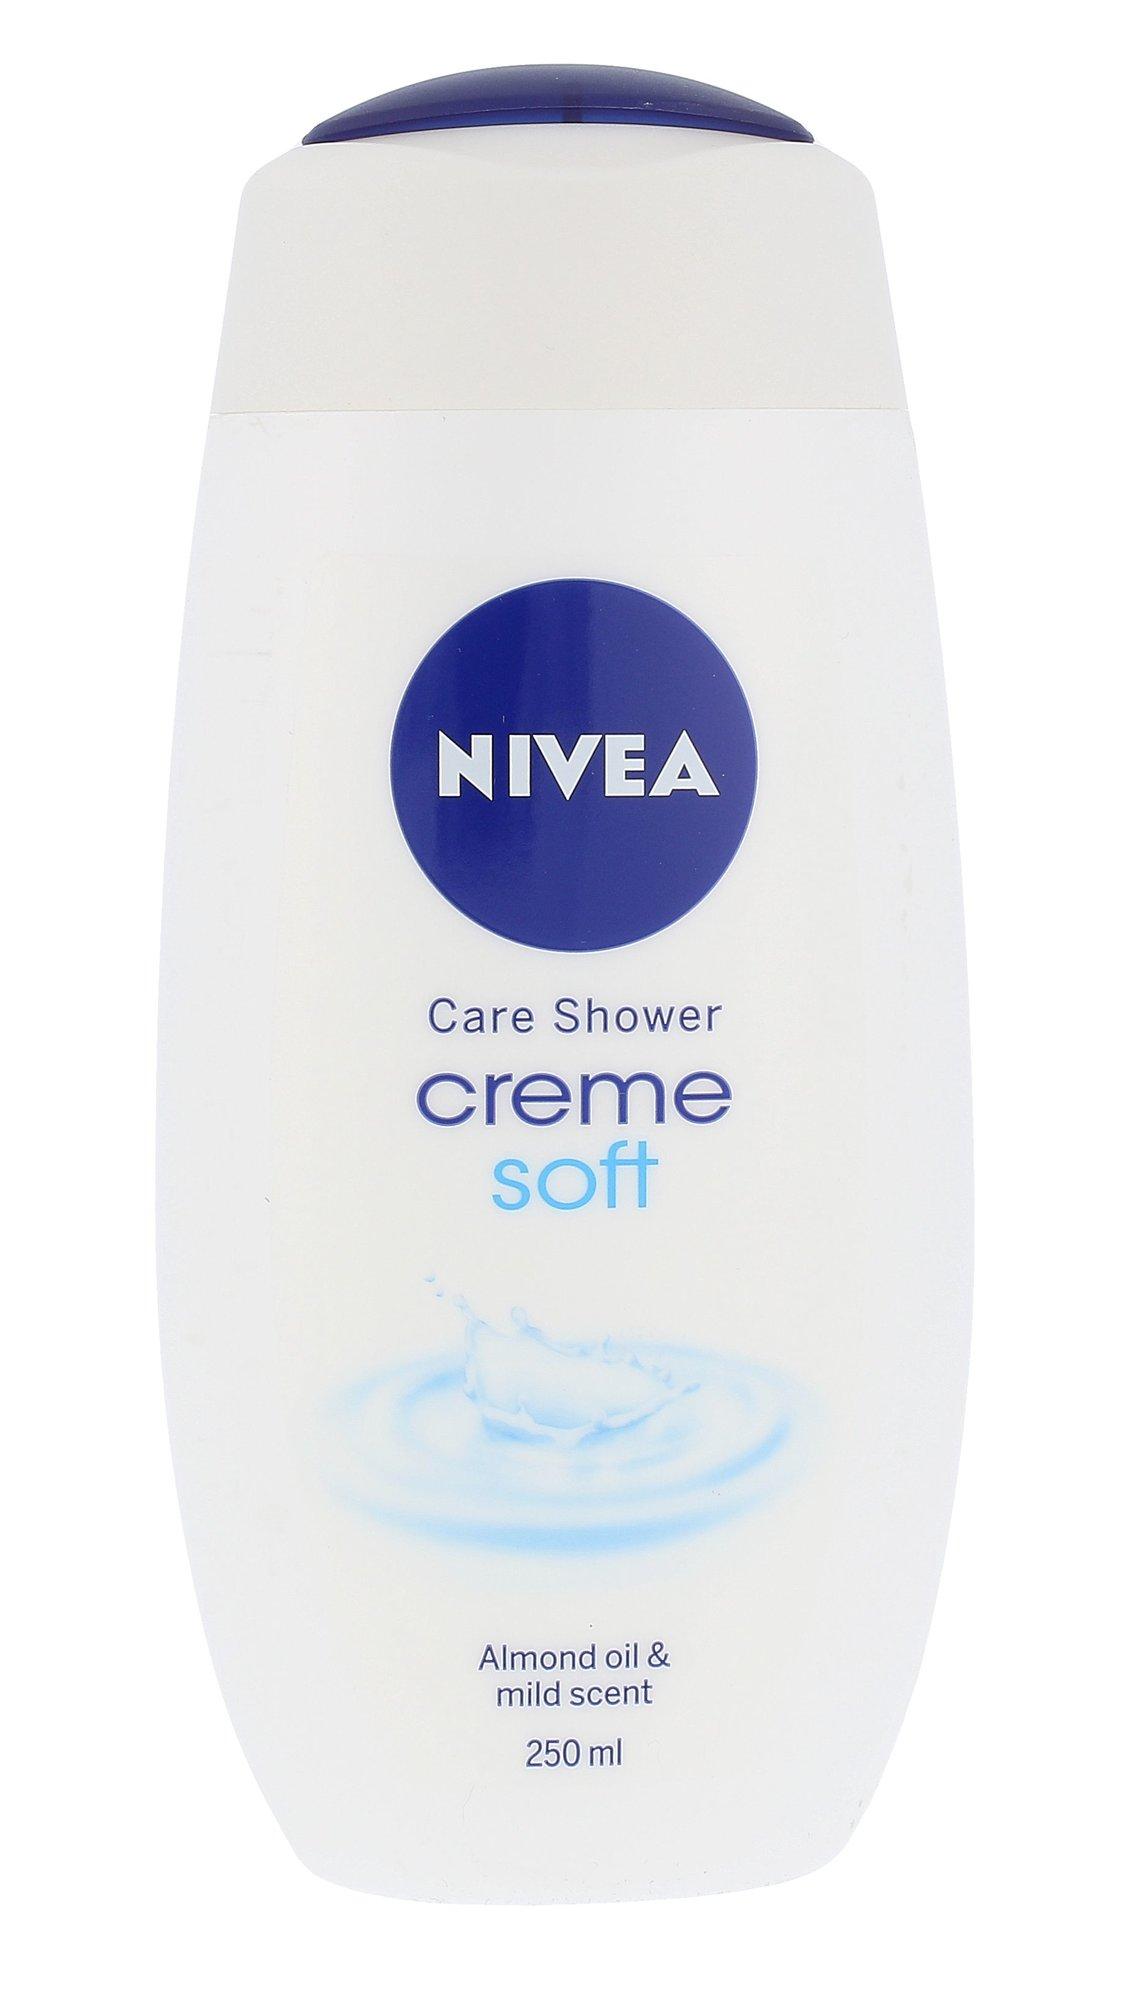 Nivea Creme Soft Cosmetic 250ml